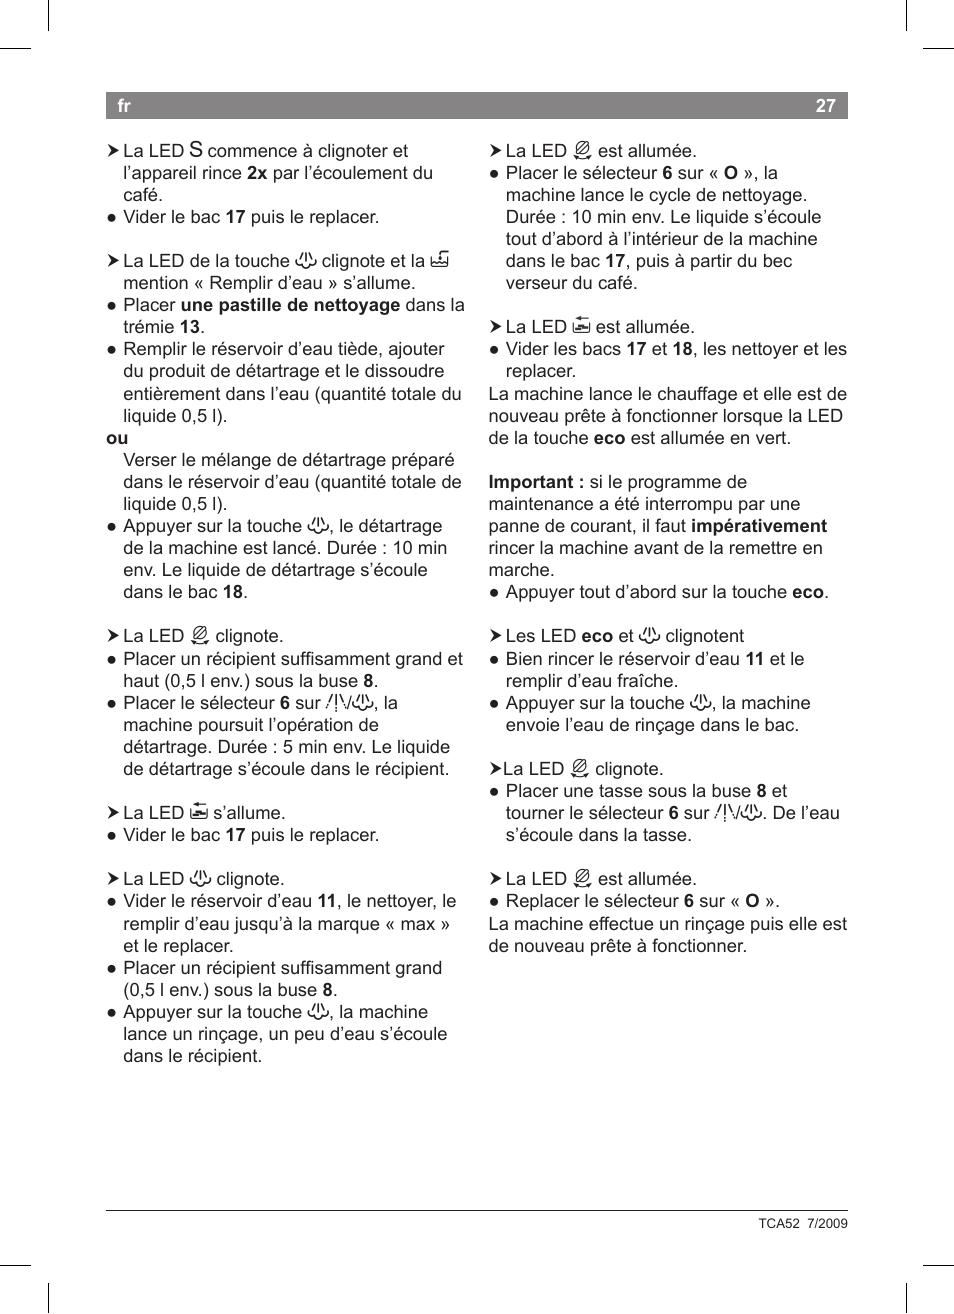 Bosch tca 5201 user manual | page 67 / 100 | original mode.